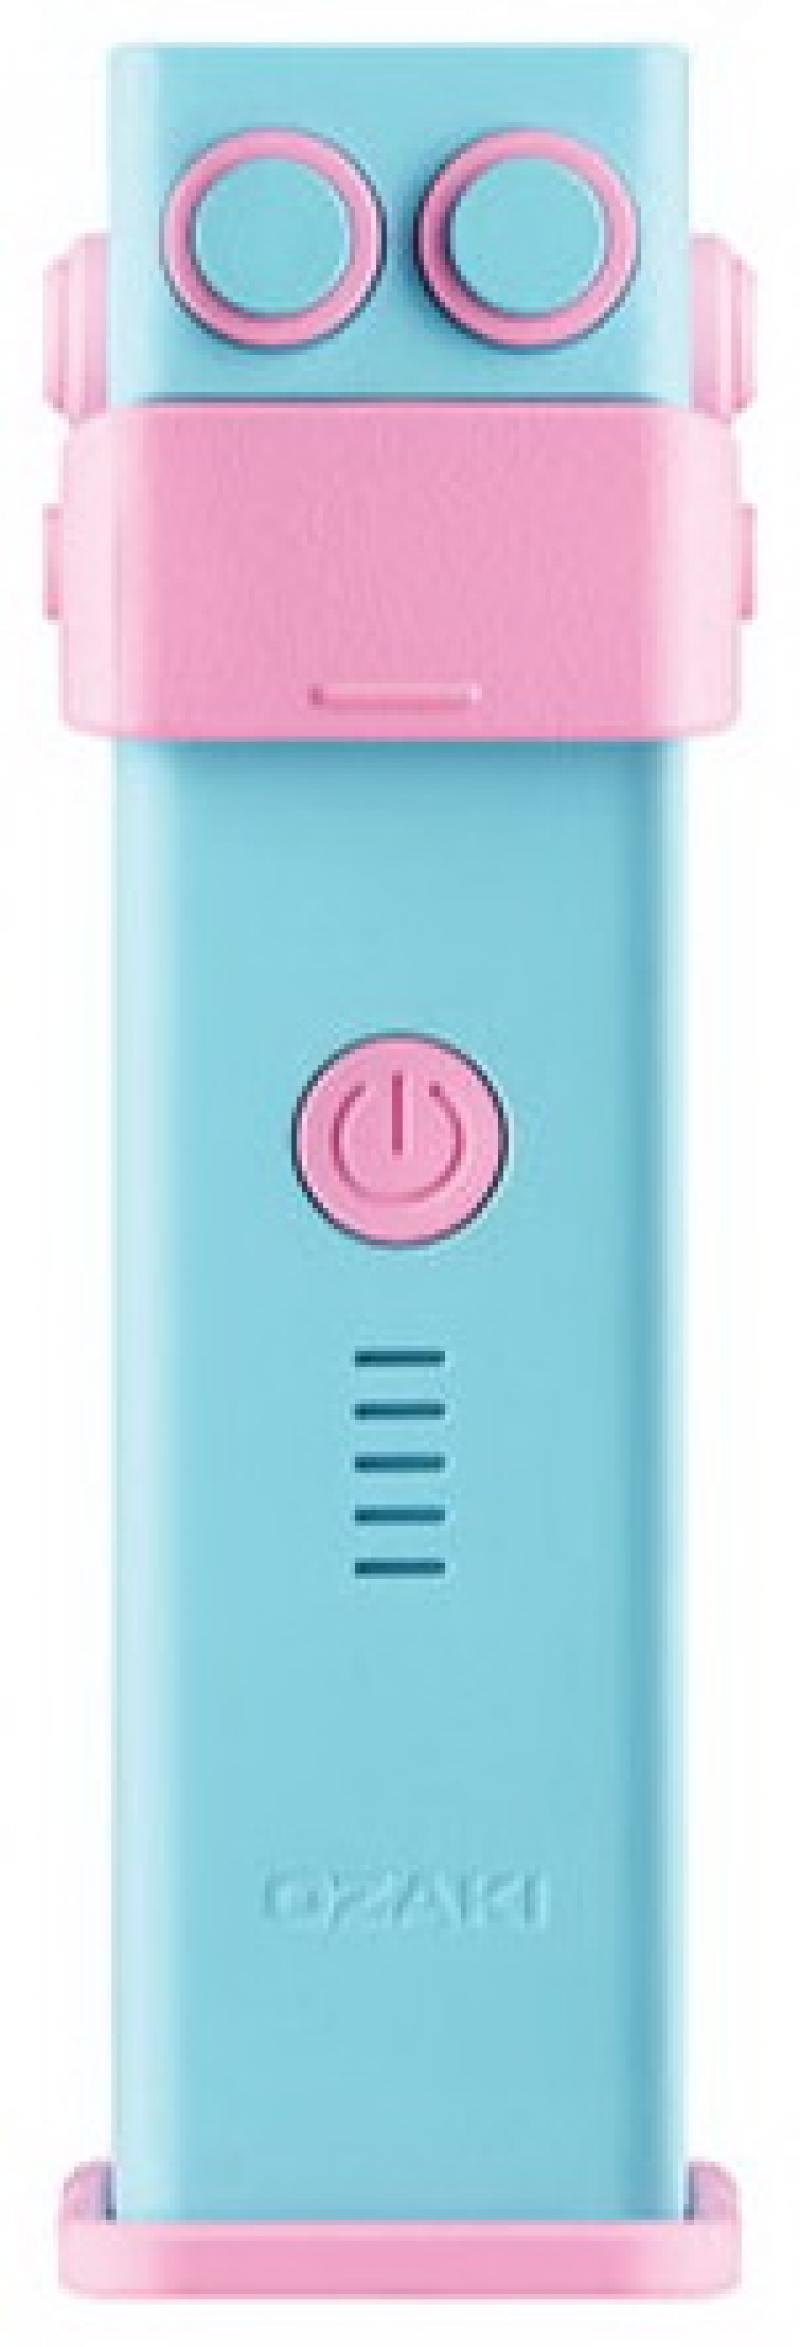 Портативное зарядное устройство Ozaki O!tool-Battery-D26 литий-ионный 2600 МаЧ голубой ОТ240АВ